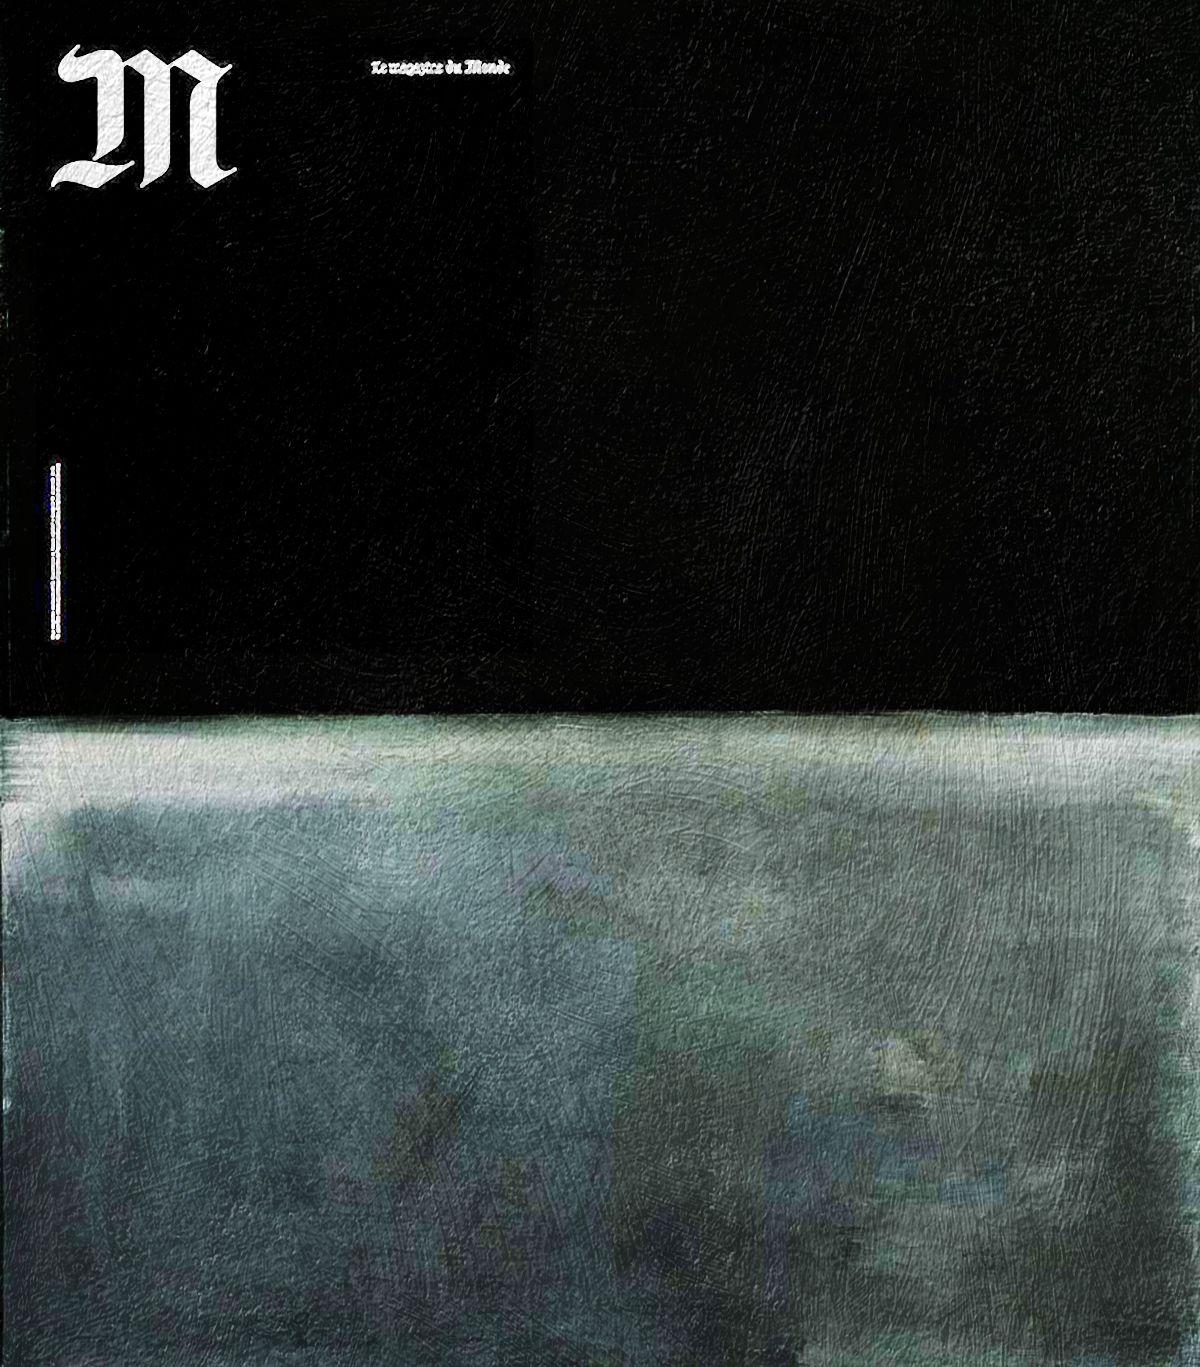 Death is BlackCharlie Hebdo shooting, M le magazine du journal Le Monde January 2015 + Untitled (Black on Grey) by Mark Rothko